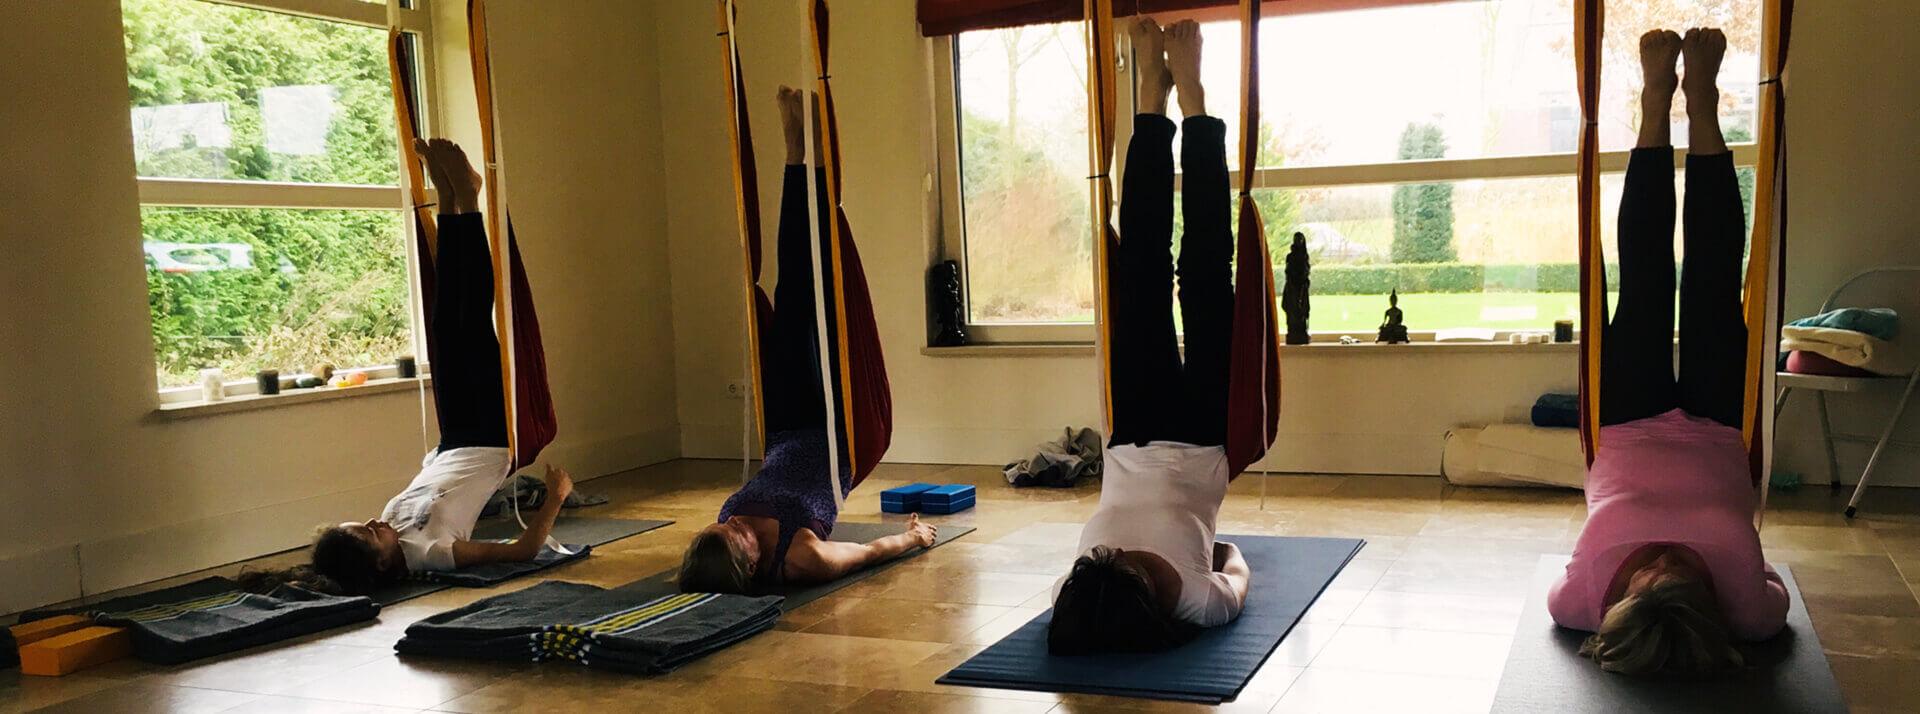 banner-hangmat-yoga